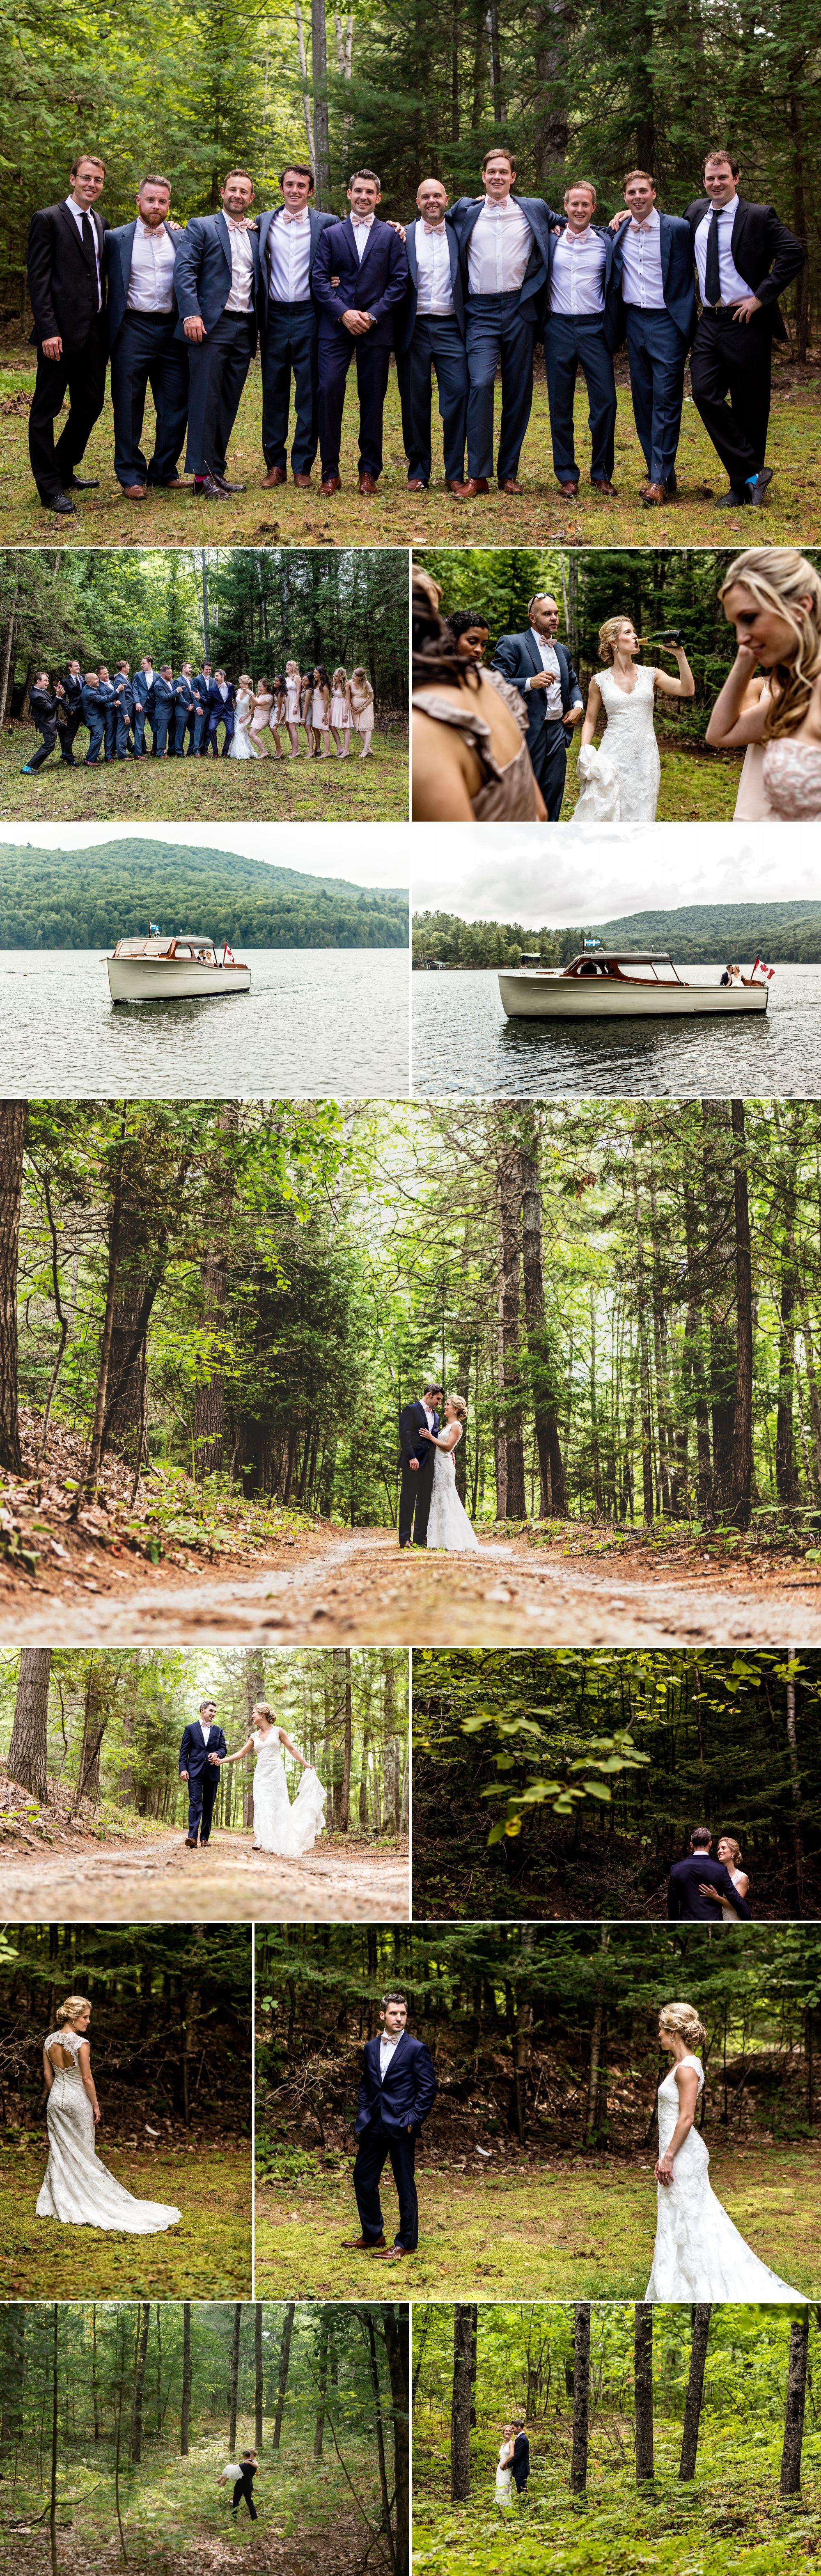 Couples photos and wedding part photos at a cottage wedding near ottawa